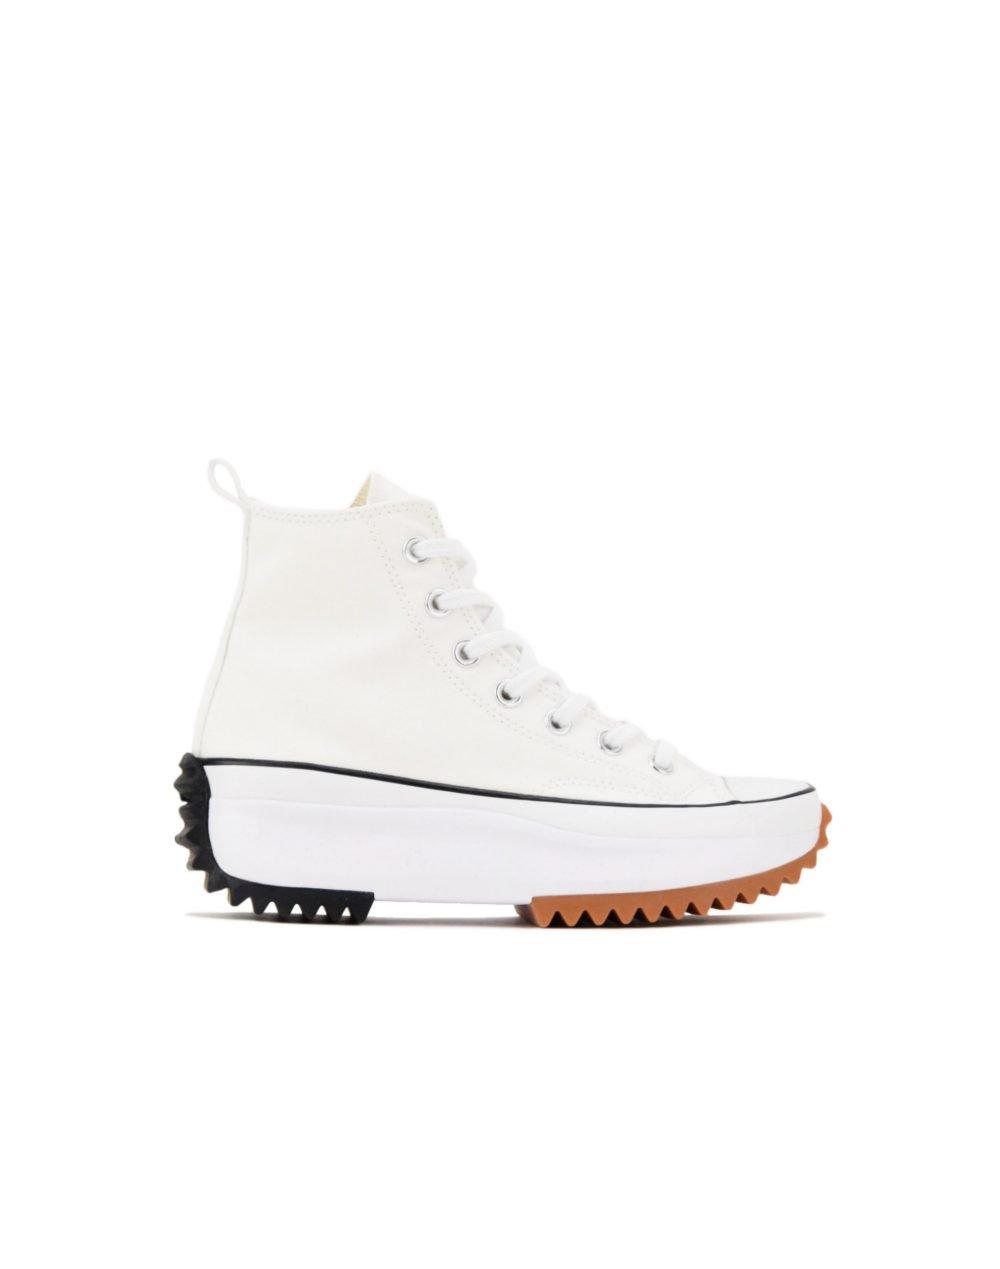 Converse Run Star Hike Hi (166799C) White/Black/Gum